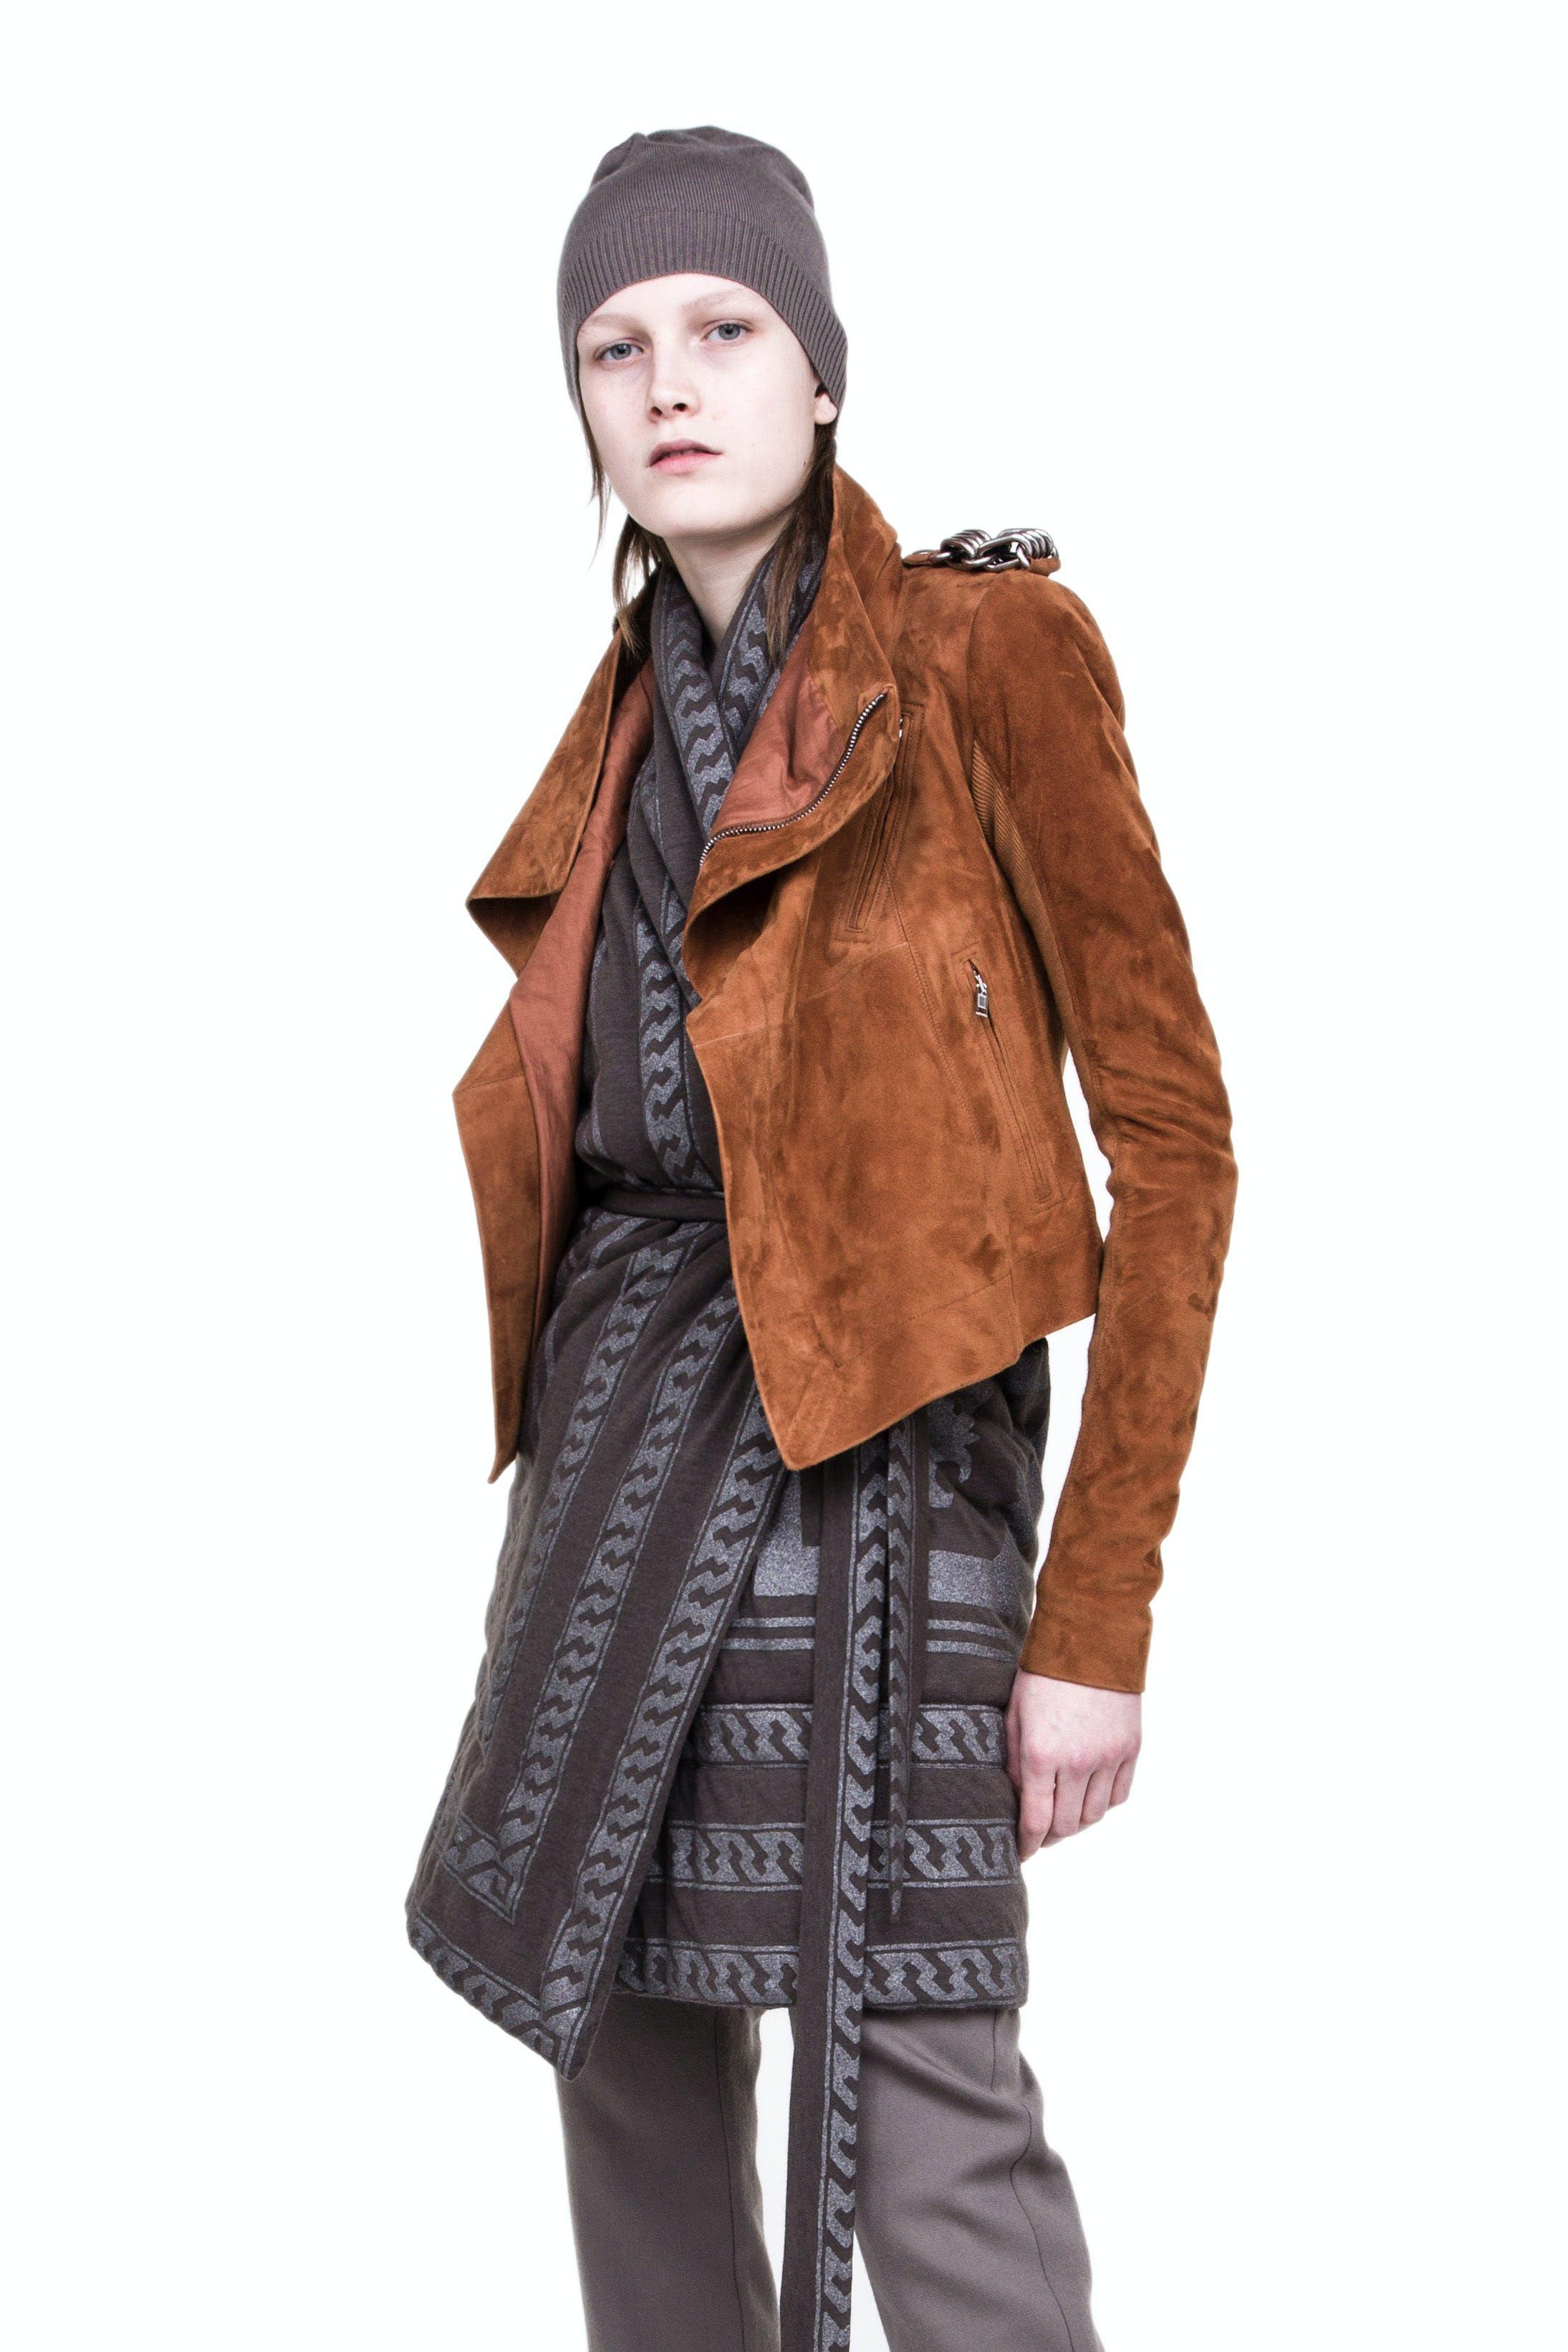 Rick Owens Campaign Wool Beanie in Grey Suede Classic Biker Jacket in Brown Tie Print Cardigan Womens SS19 Babel